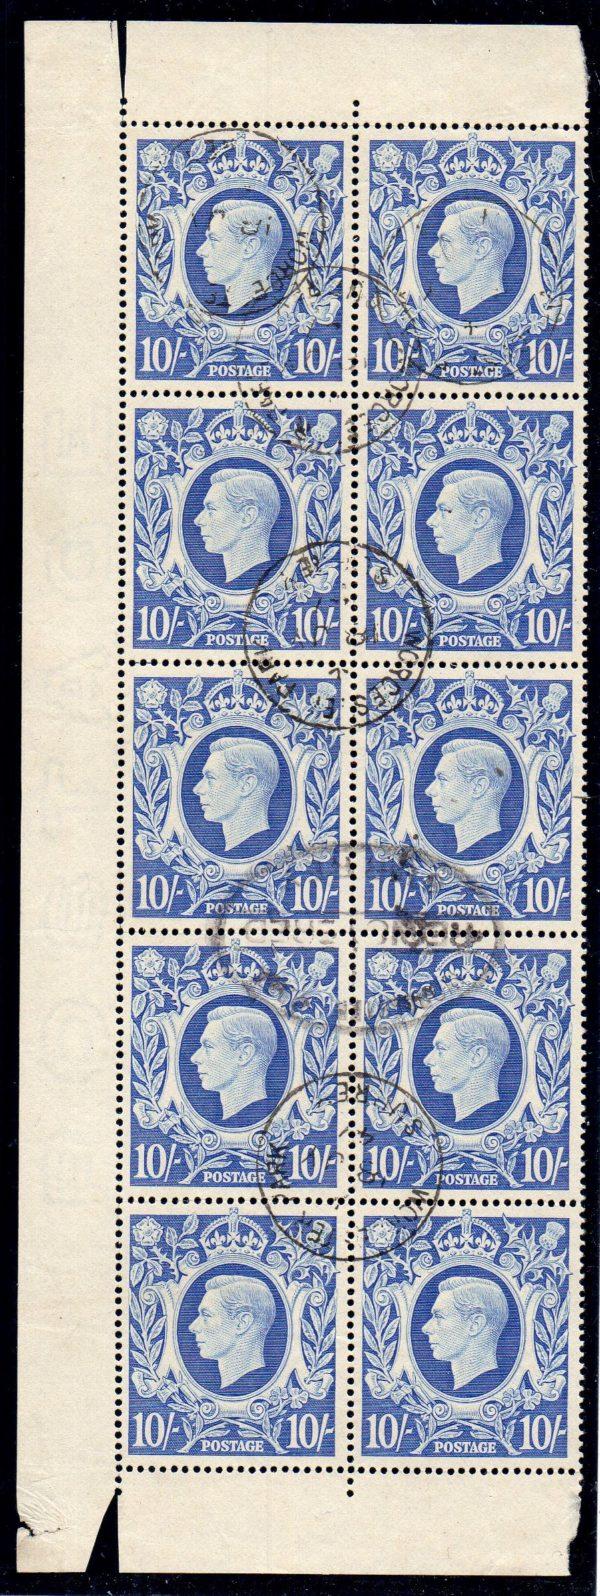 KGVI sg478b 10s ultramarine block fine used 1947 Worcester Park cds